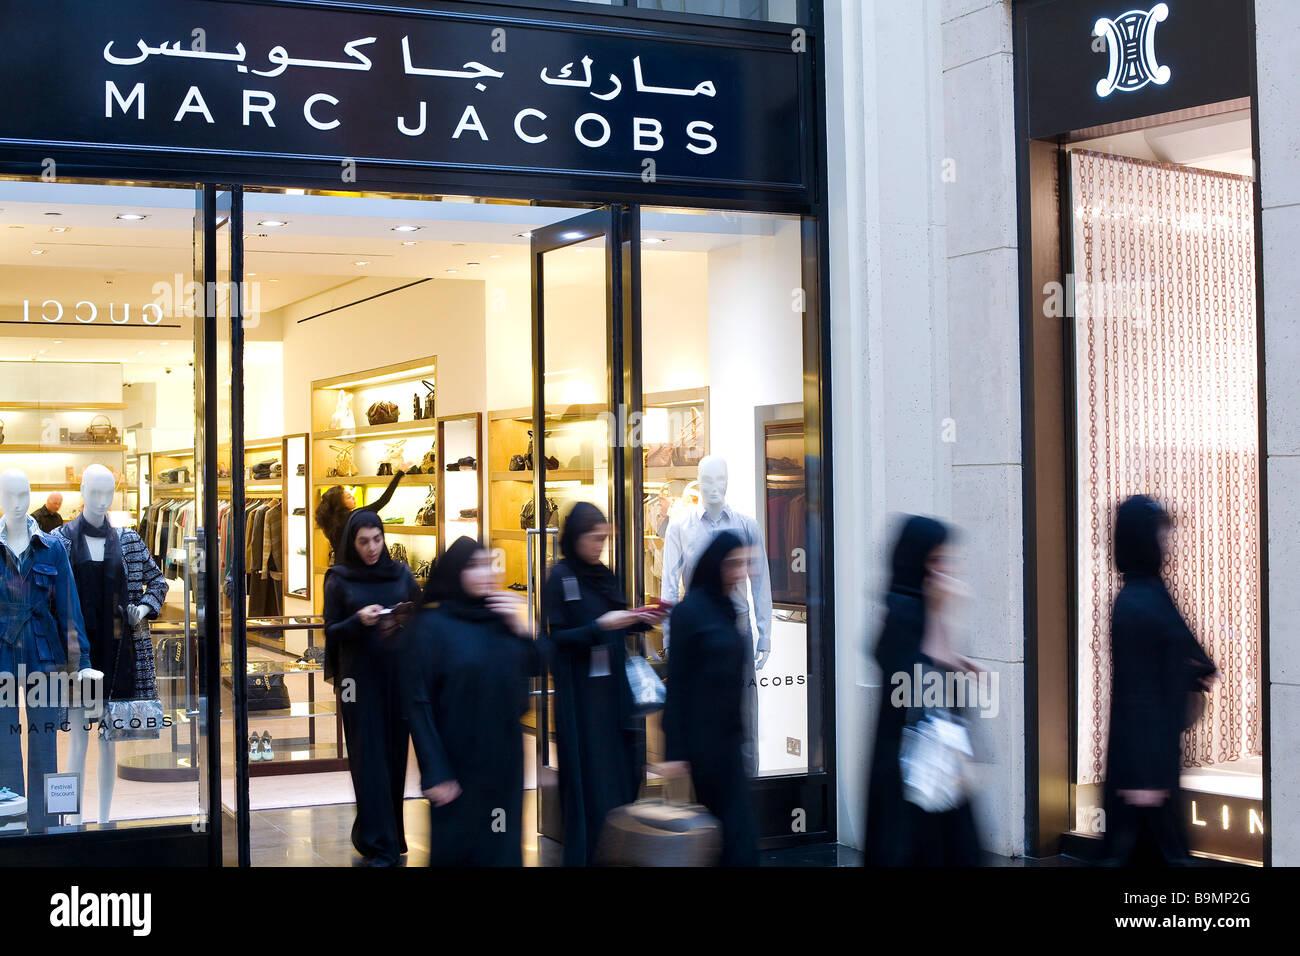 49bdc5d9d1c United Arab Emirates, Dubai, Mall of the Emirates, Via Rodeo, Marc Jacobs